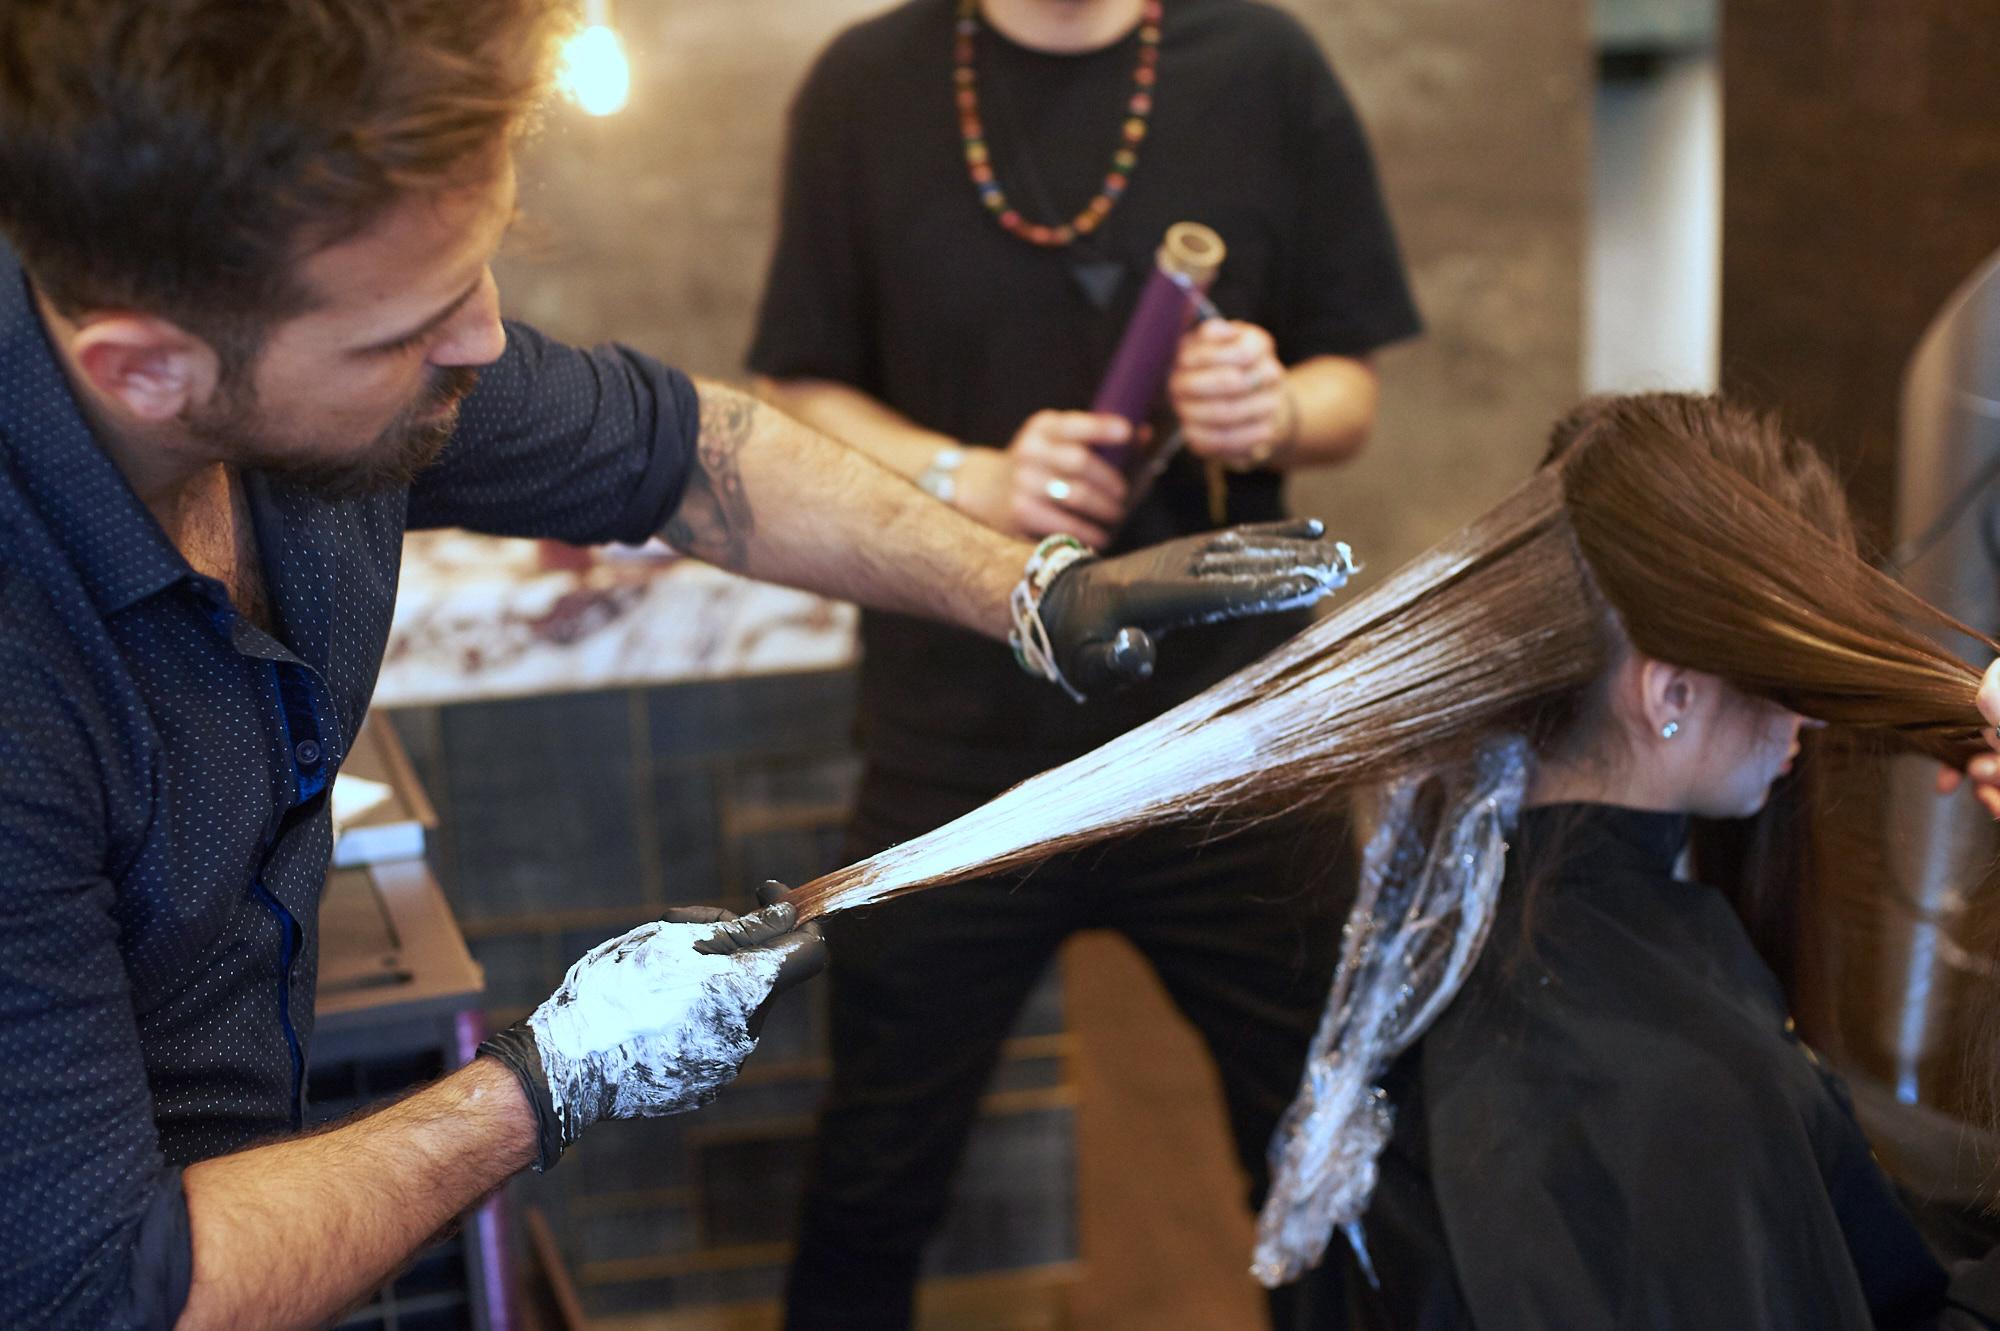 Gennaro Dell'Aquila natural hair dye